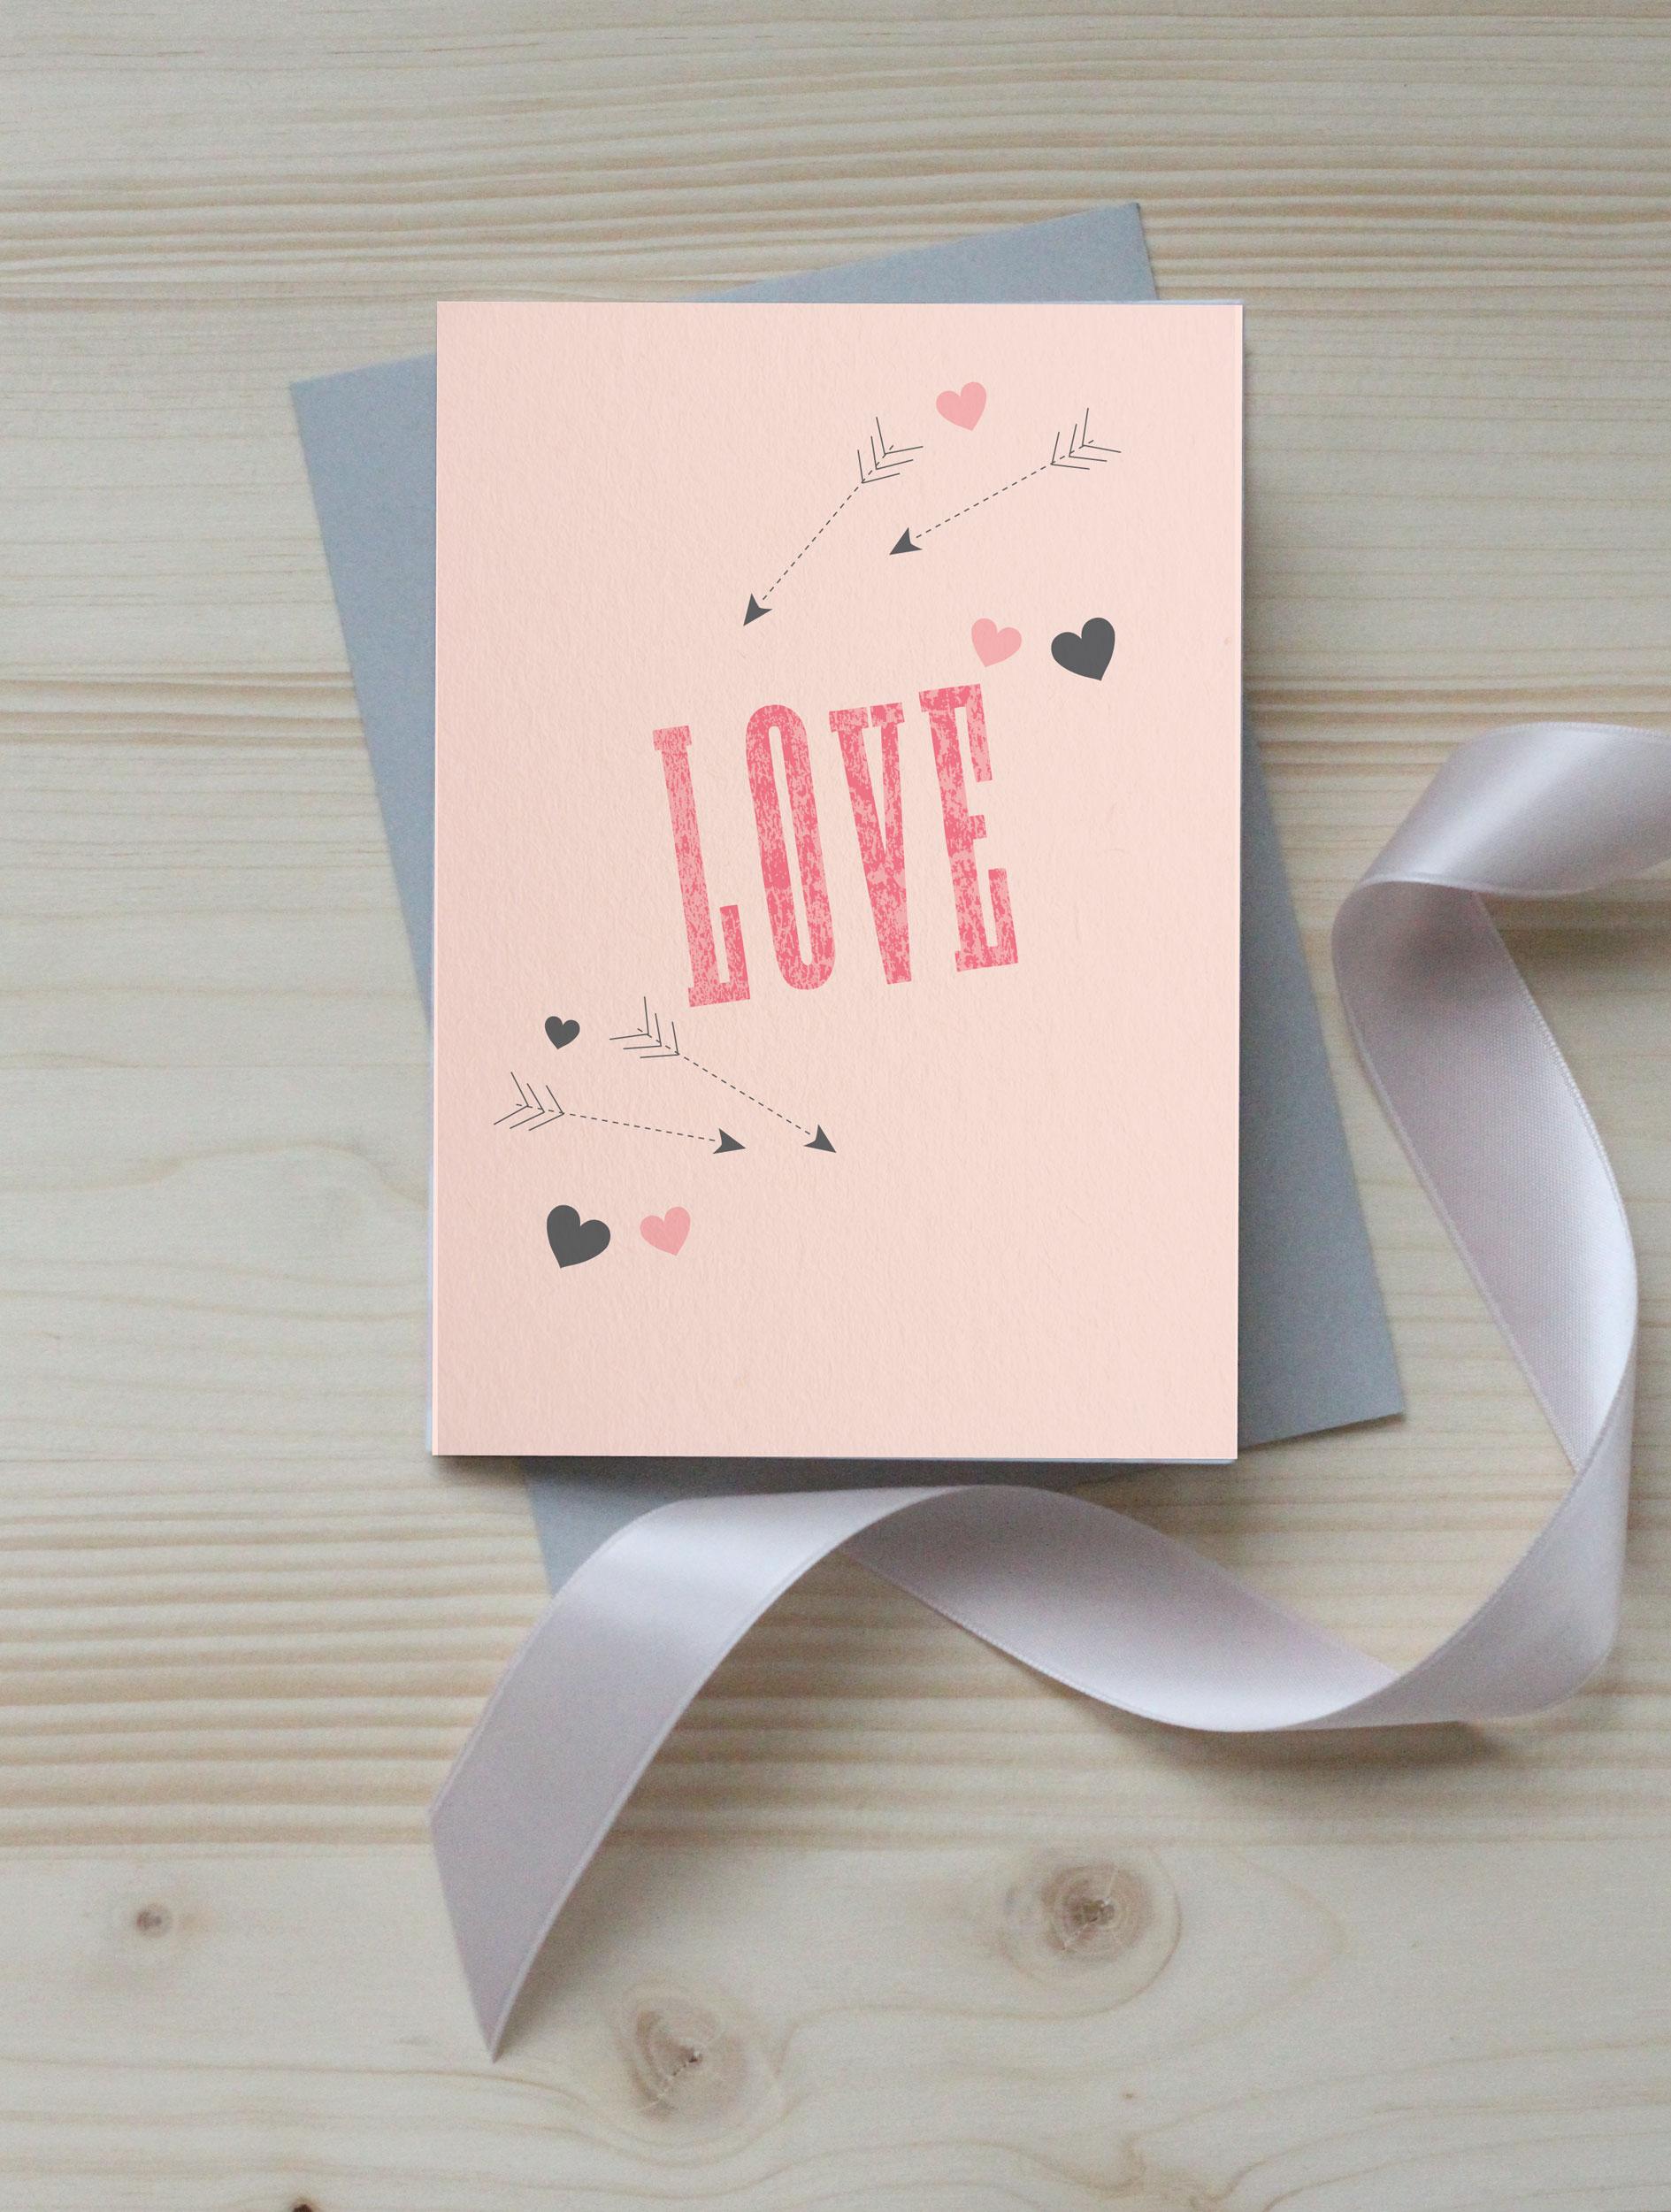 'Love' free Valentine's printable card